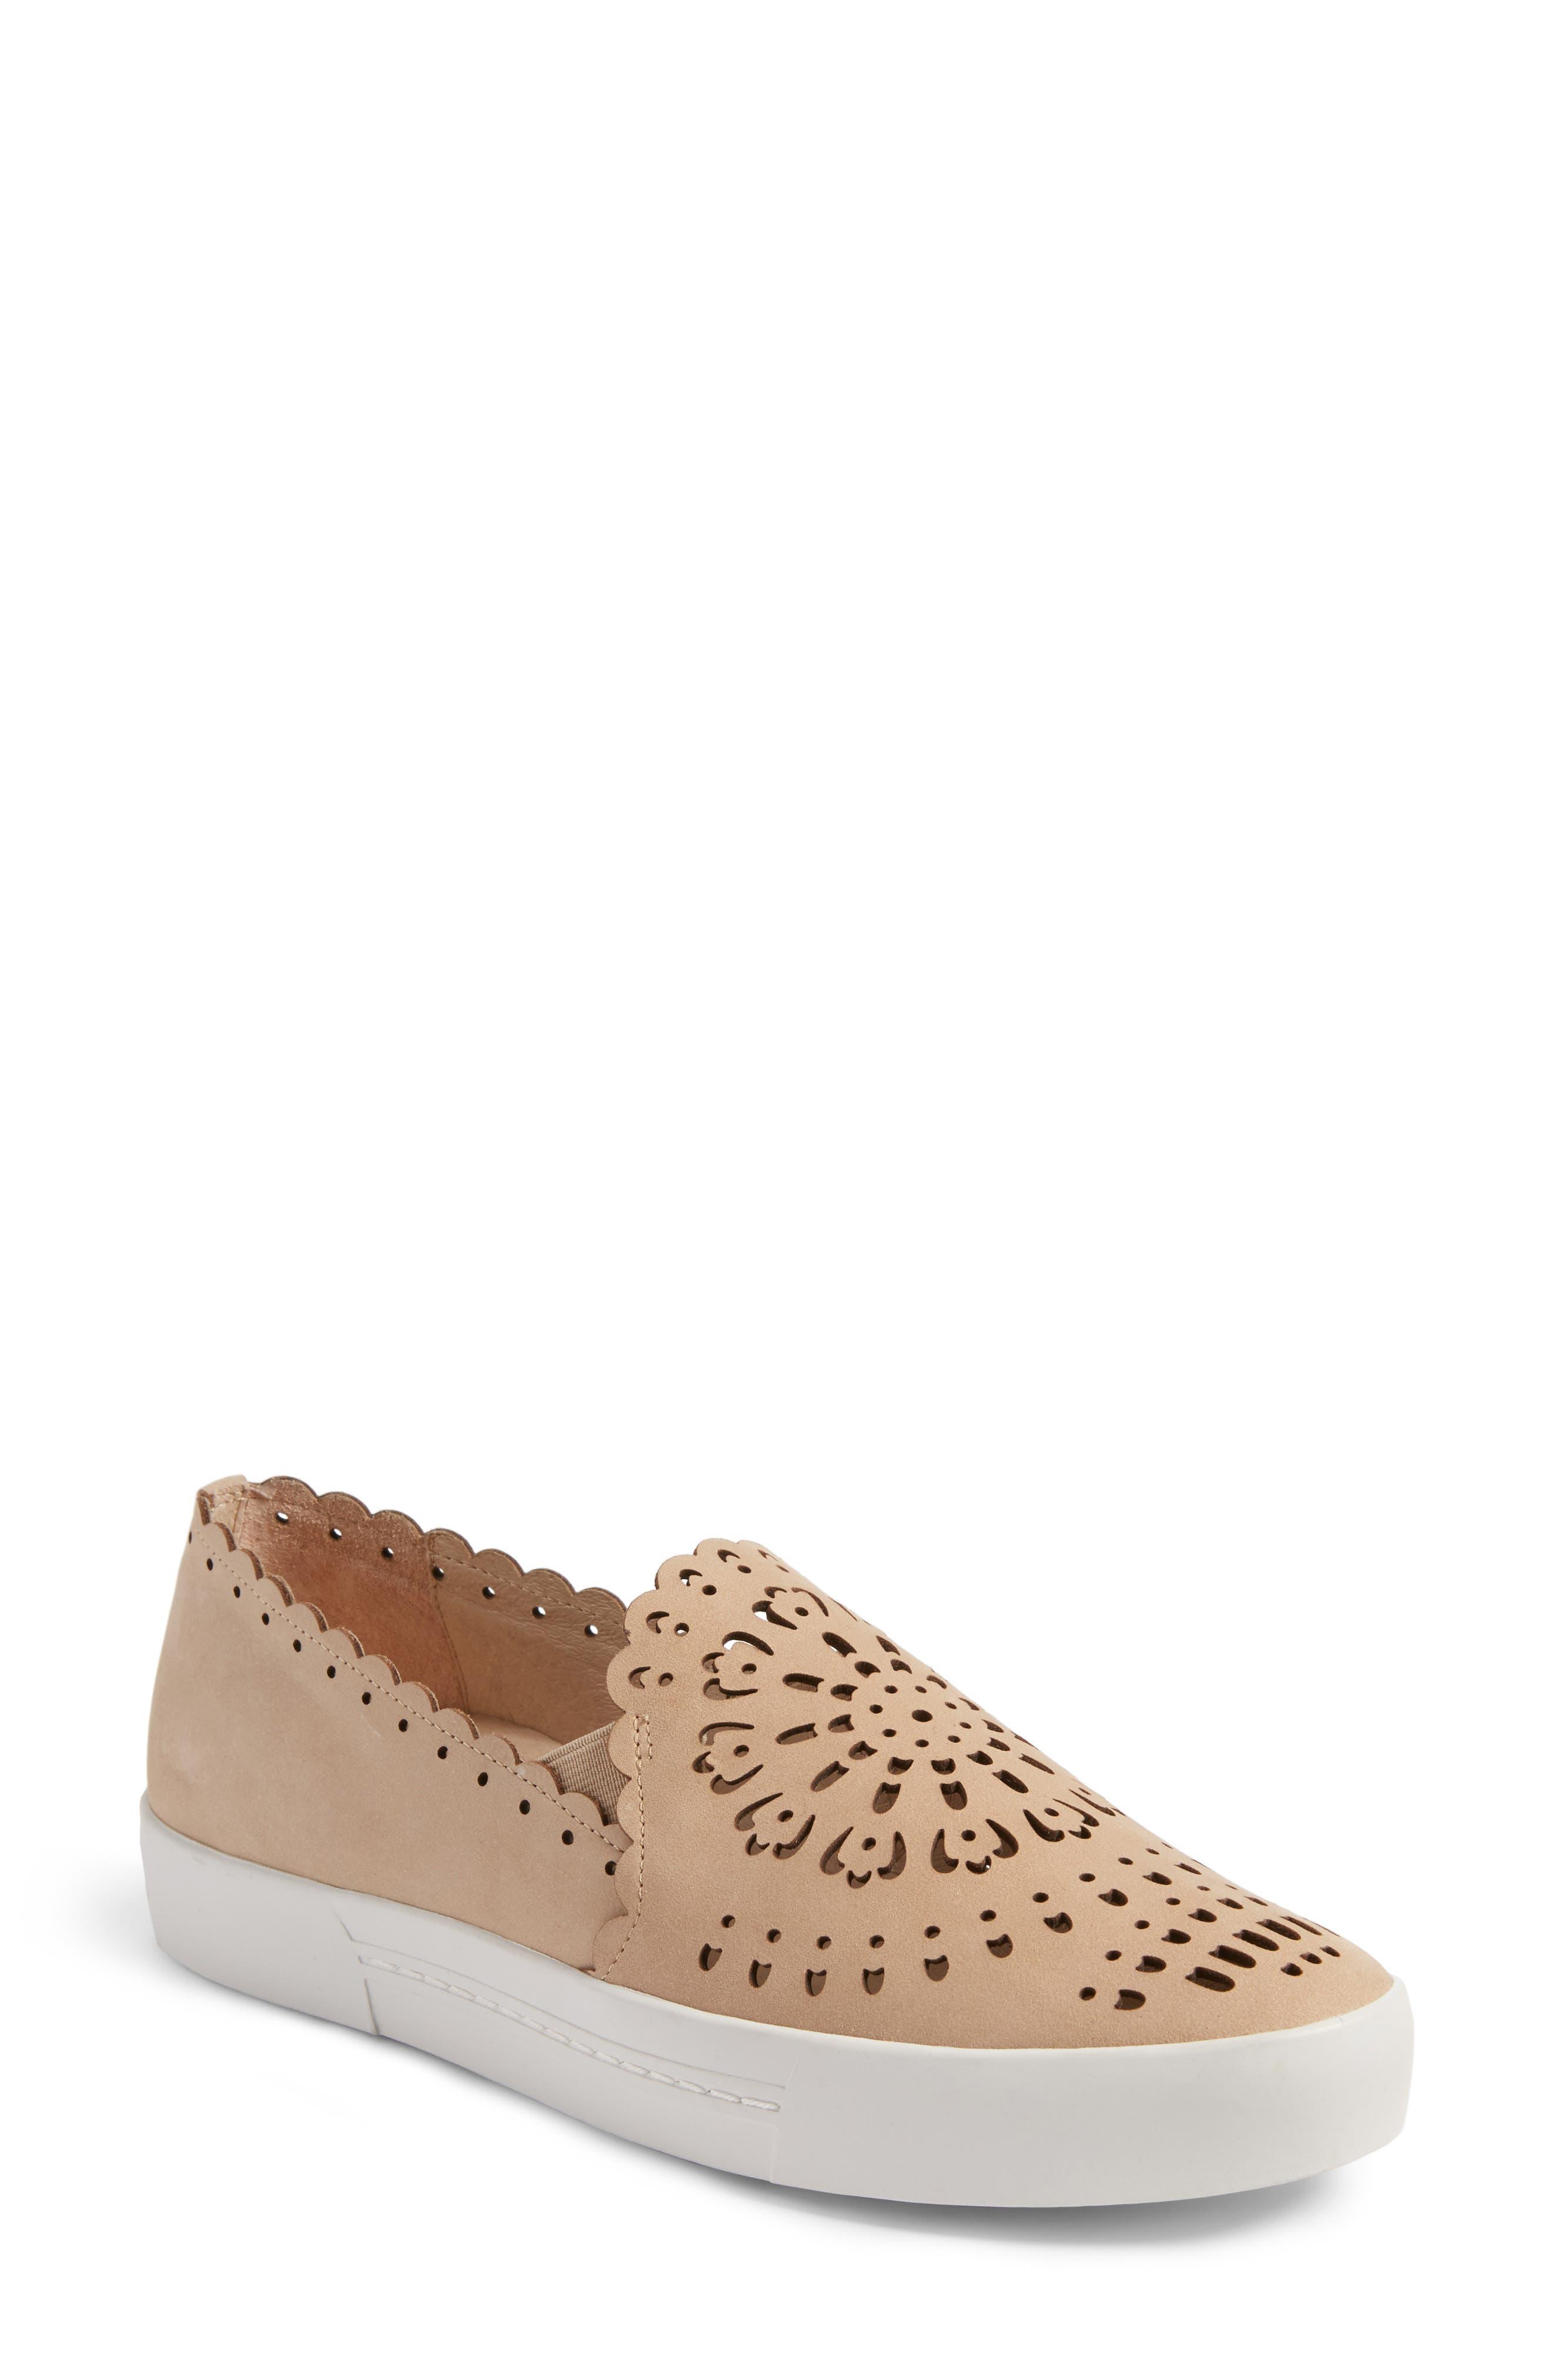 Diya Slip-On Sneaker,                         Main,                         color, 106